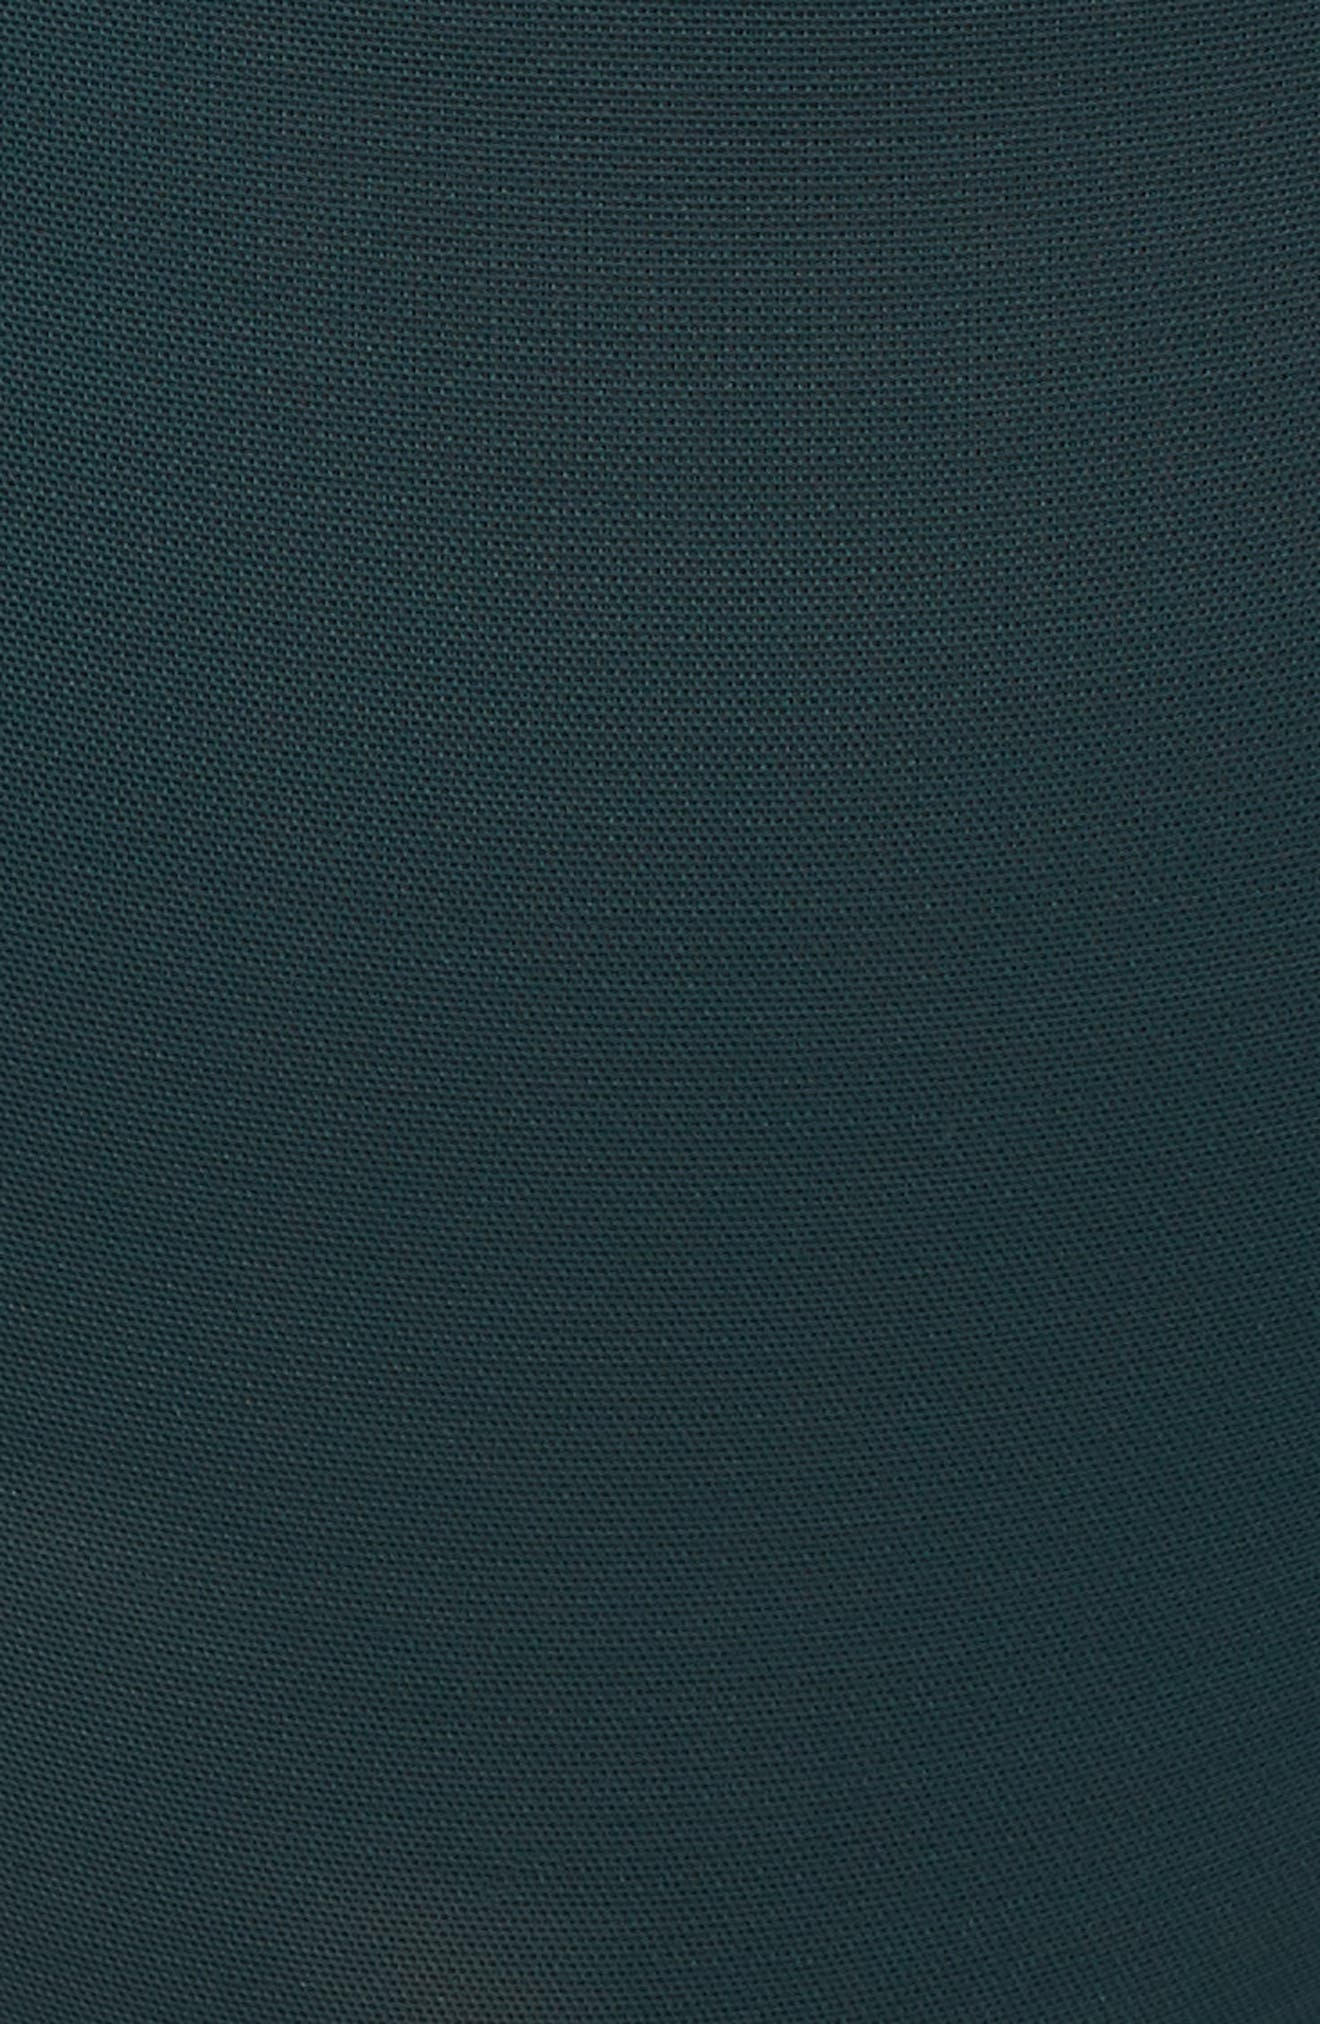 Spotlight On Lace Briefs,                             Alternate thumbnail 5, color,                             MALACHITE